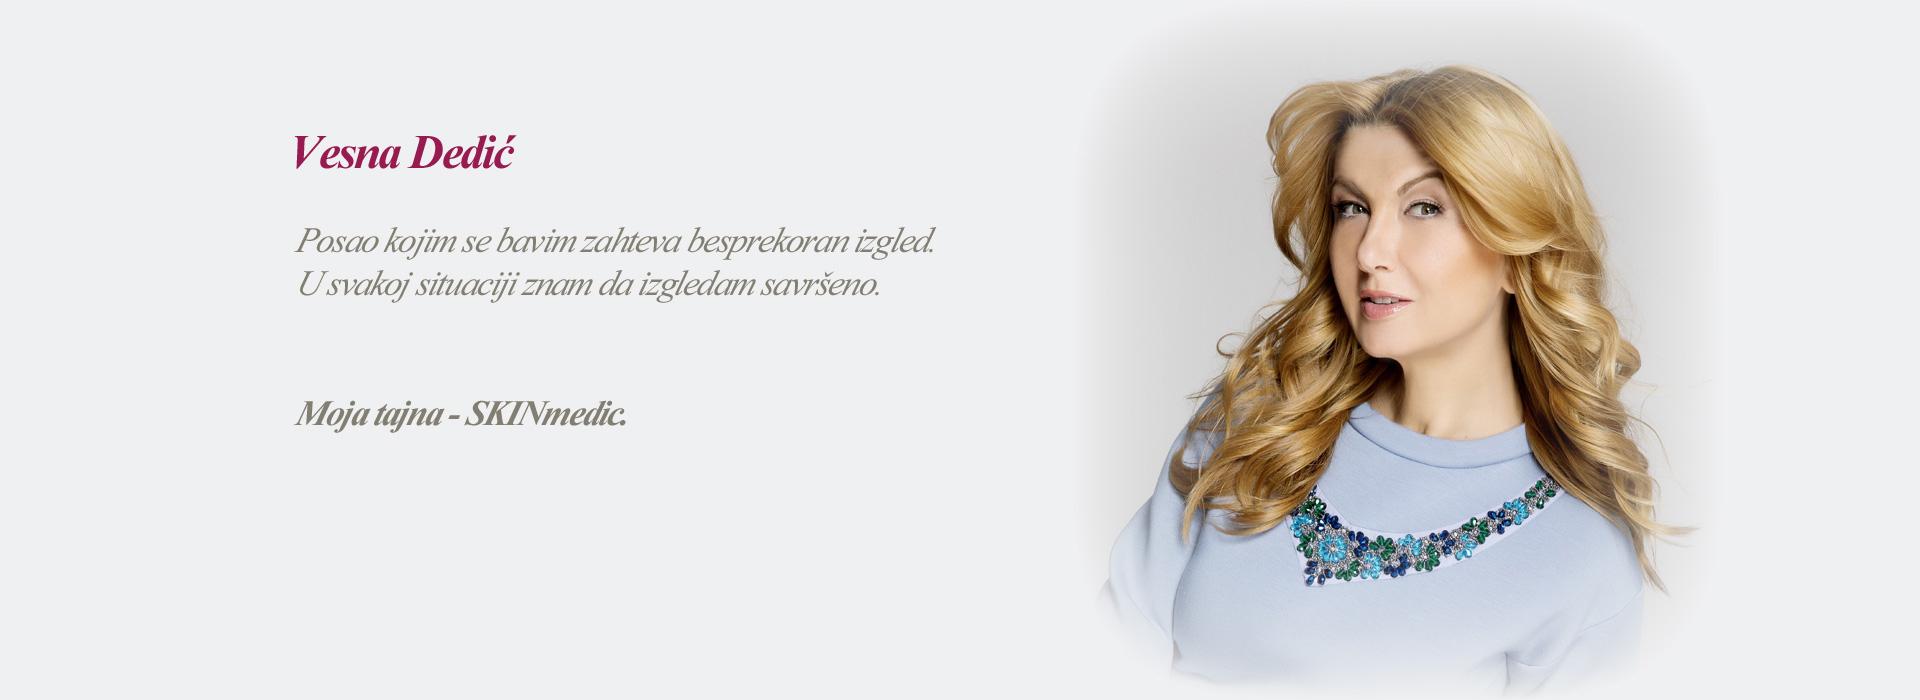 vesna2015